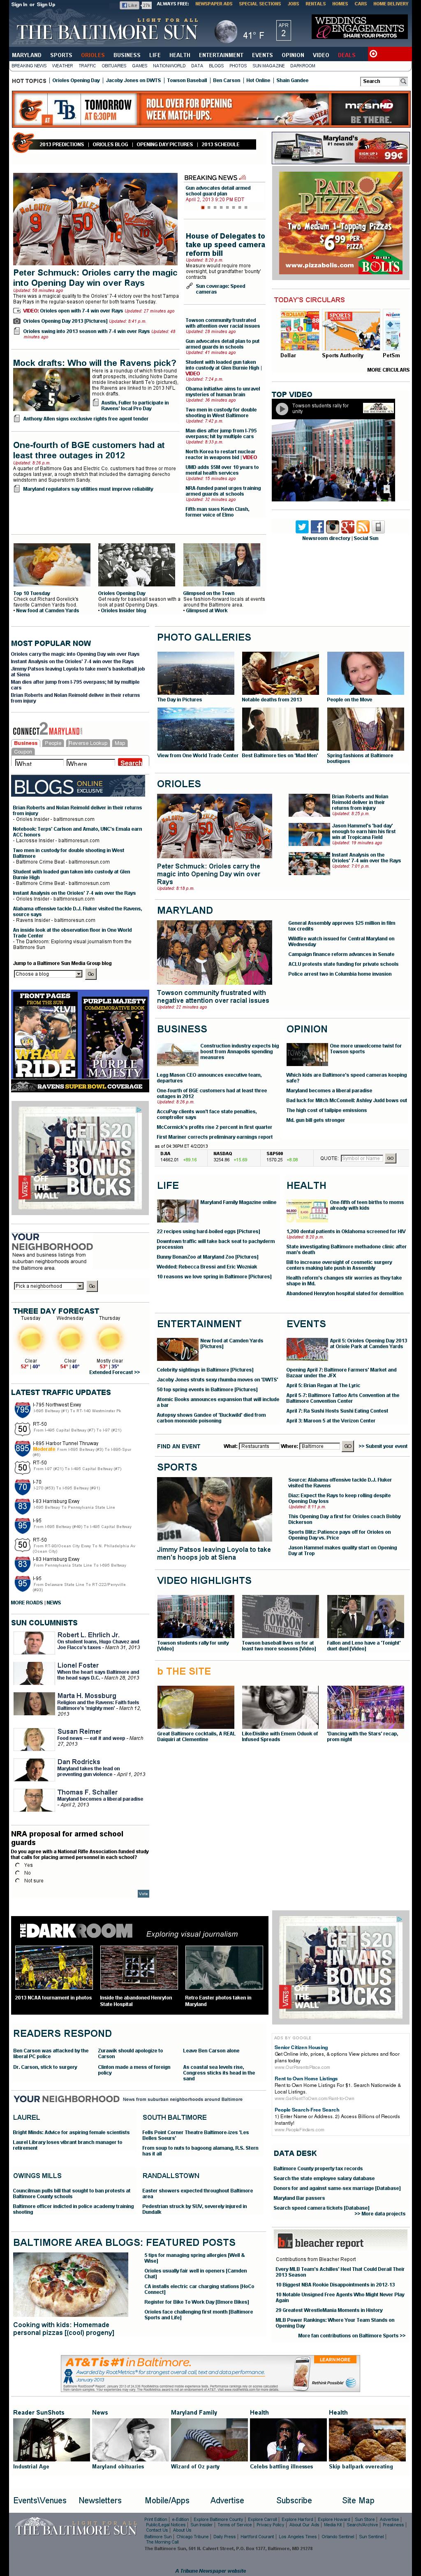 The Baltimore Sun at Wednesday April 3, 2013, 2:01 a.m. UTC